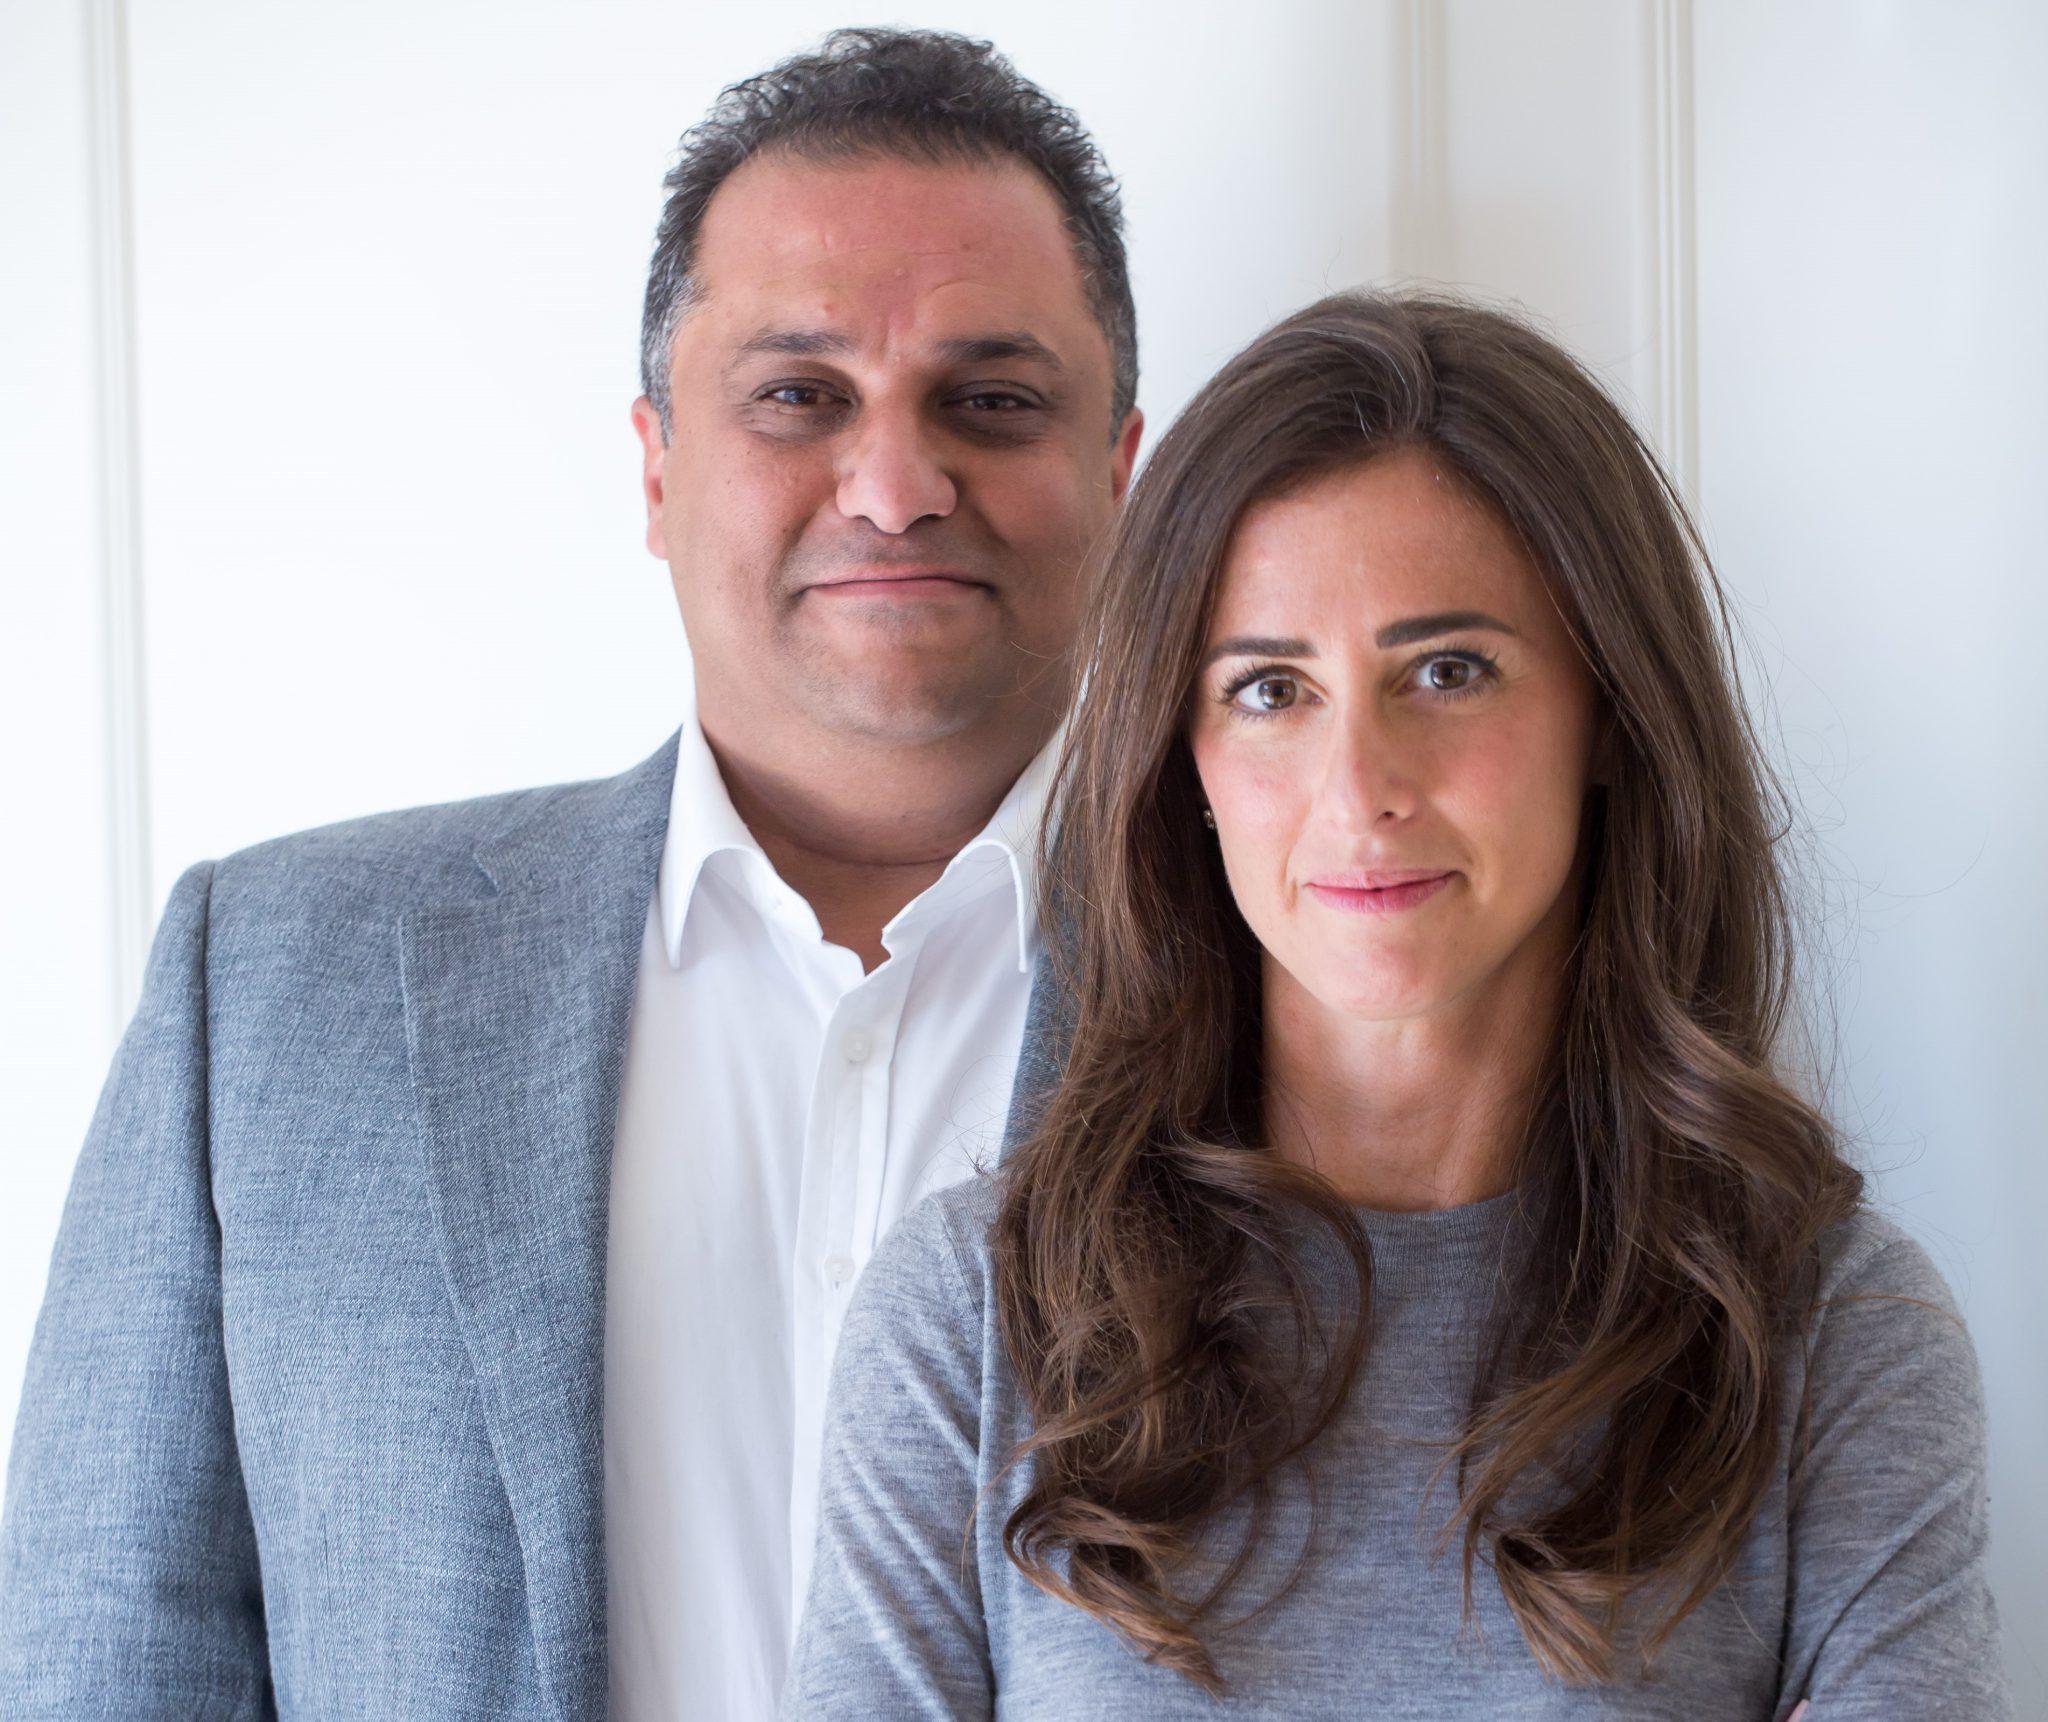 Global Ventures partners Basil Moftah and Noor Sweid